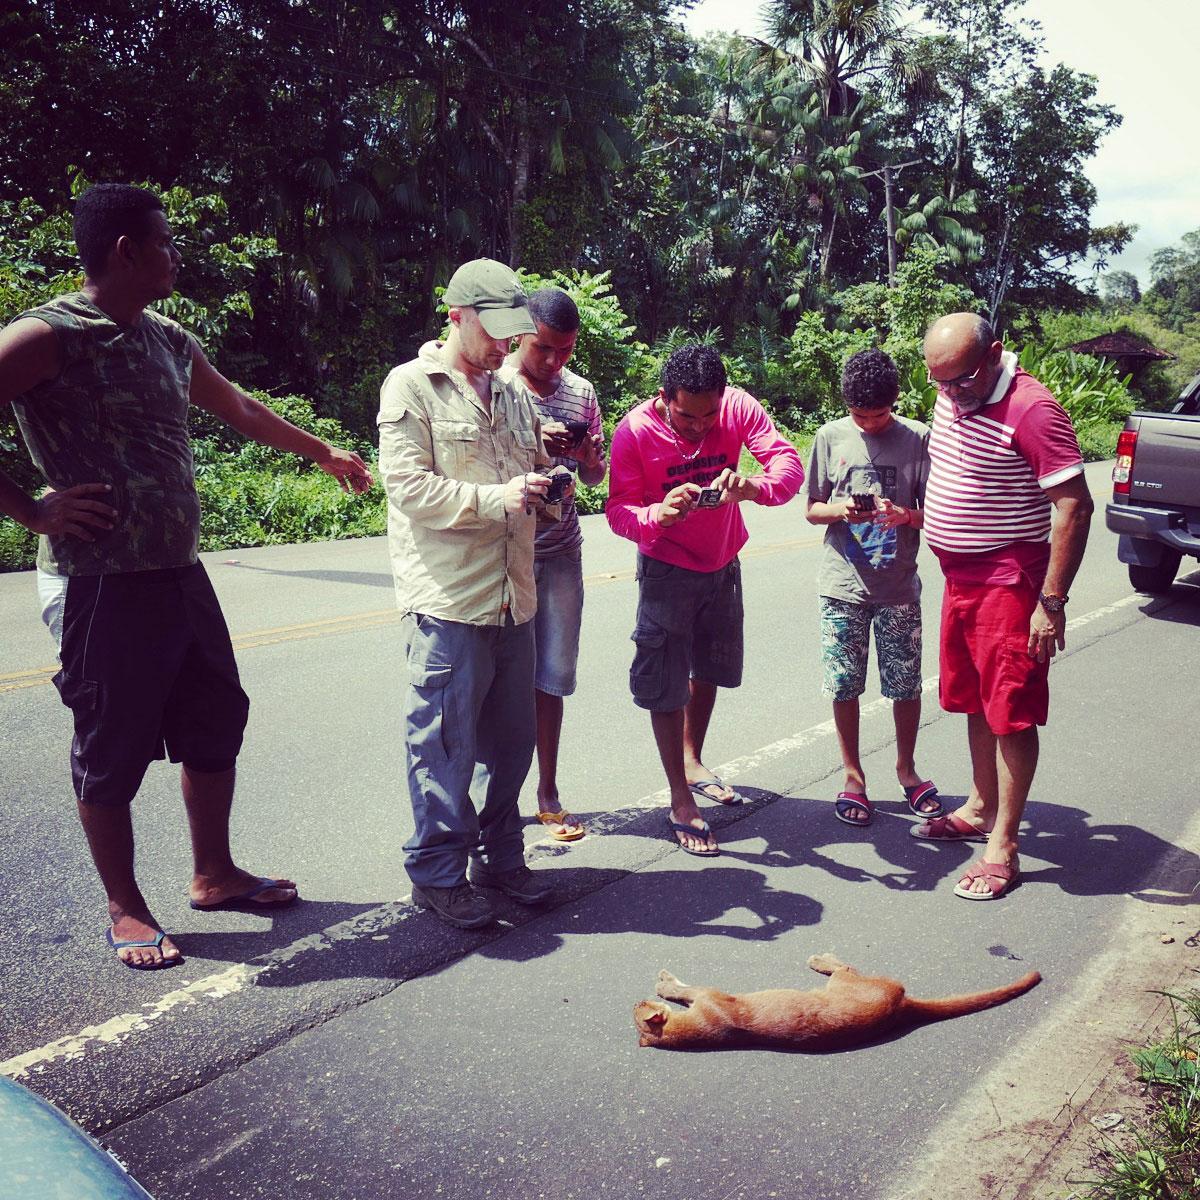 A crowd gathers around the deceased jaguarundi near Belem, Brazil. Noah Strycker